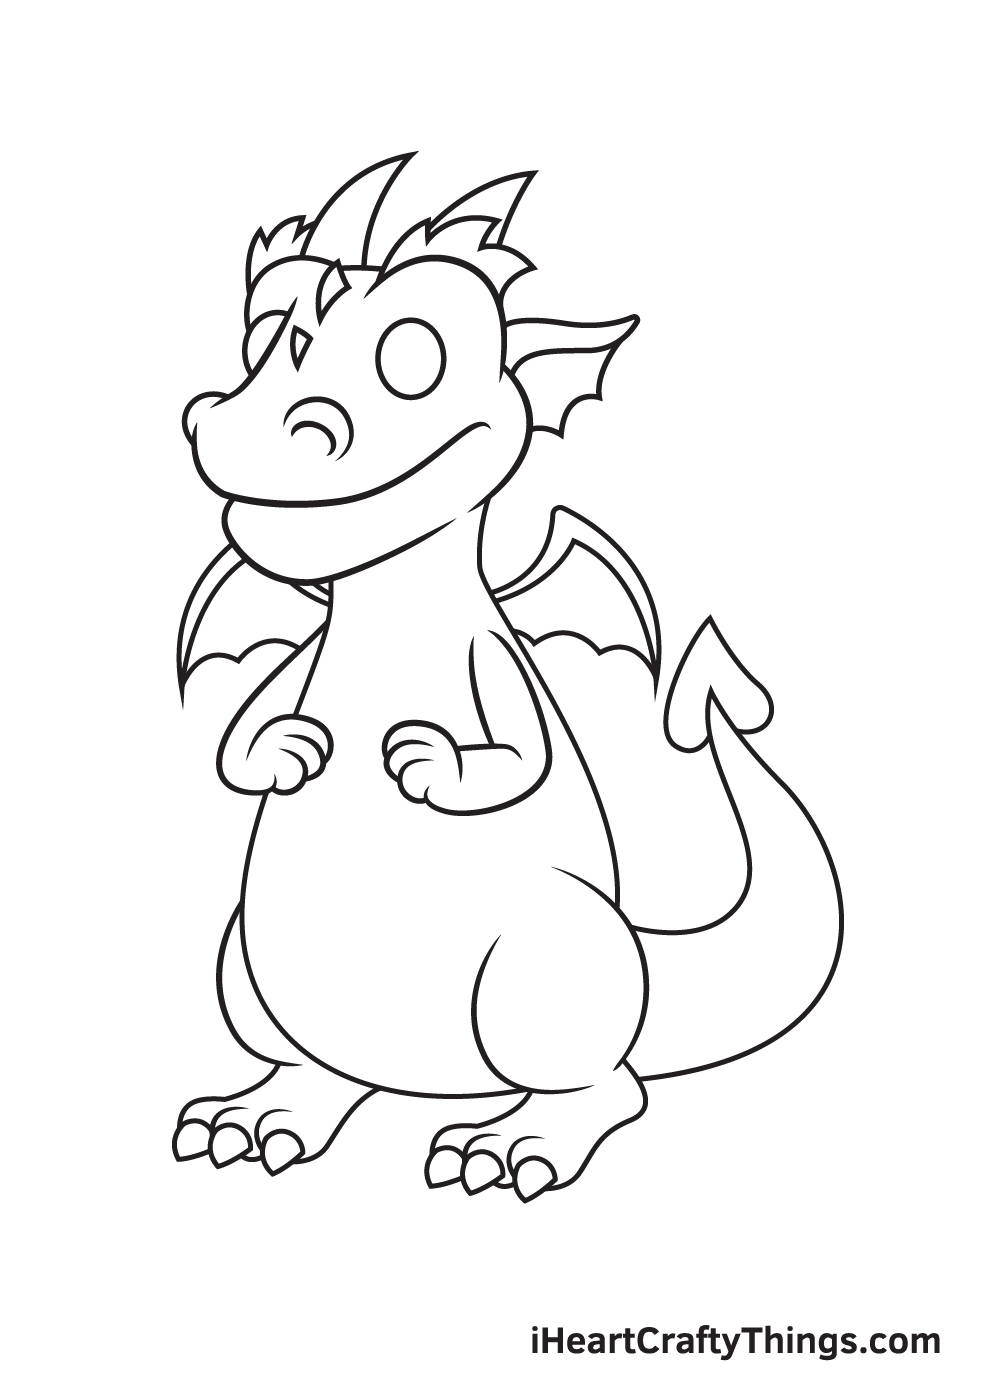 Dragon Drawing – Step 7